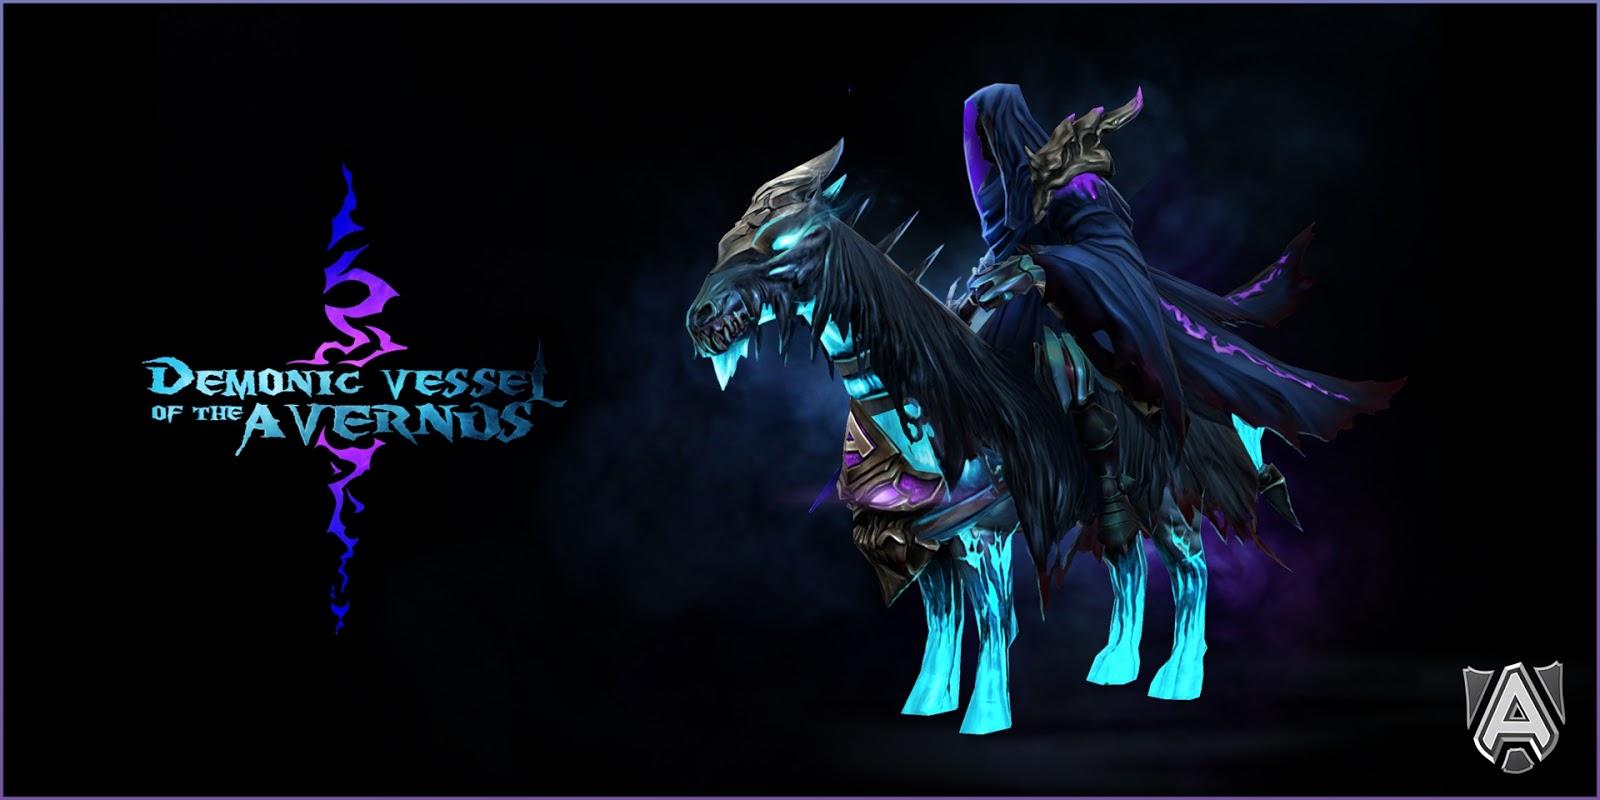 dota2 mod abaddon arsenal of the demonic vessel legendary items